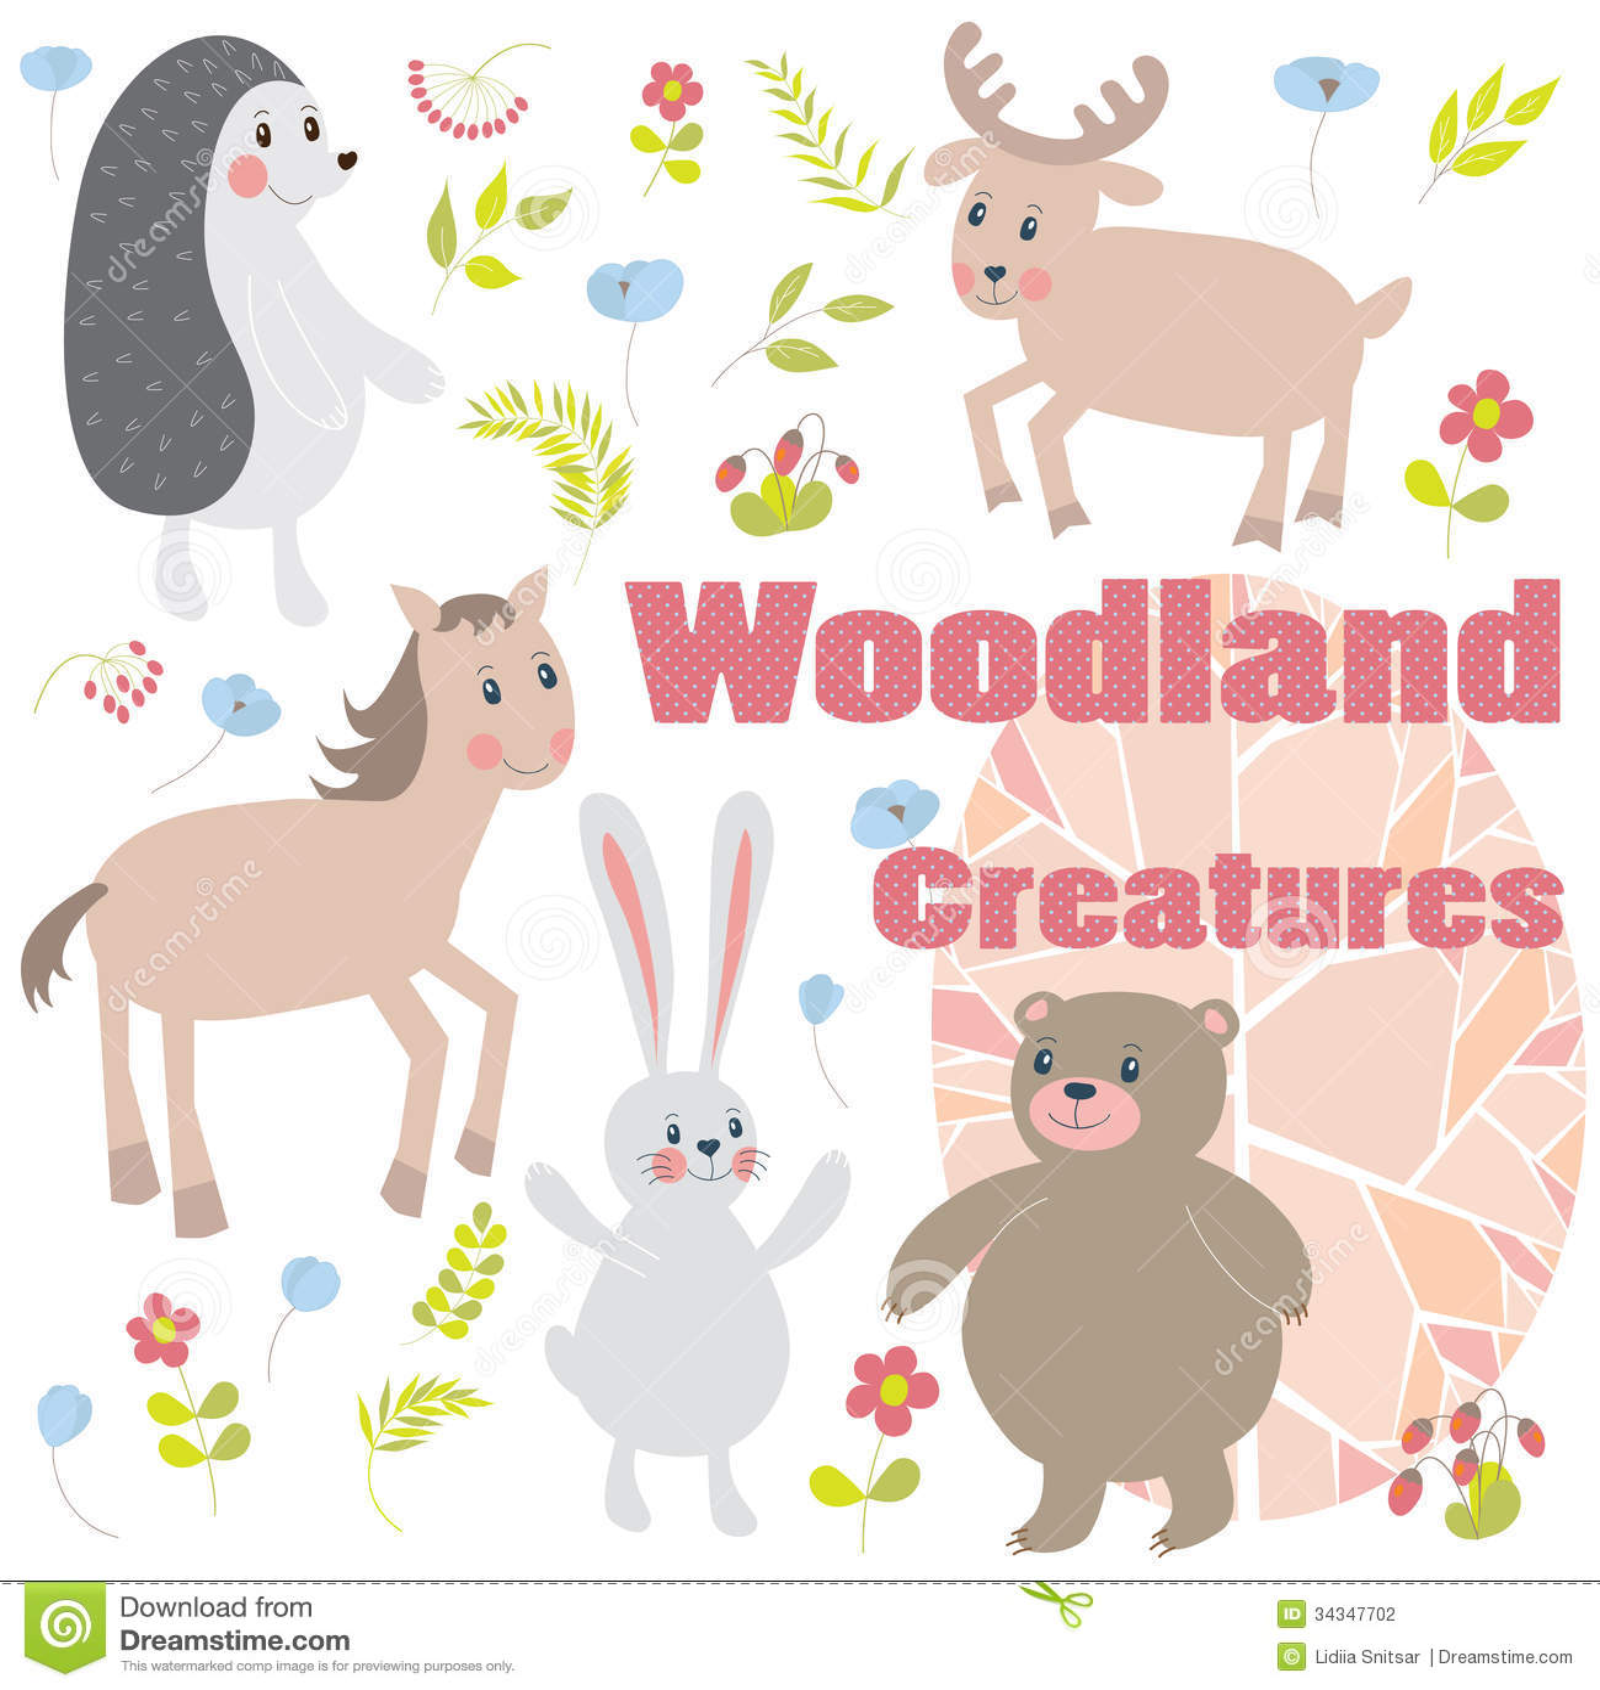 Fall Woodland Creatures Wallpaper Woodland Creatures Stock Illustration Image Of Design